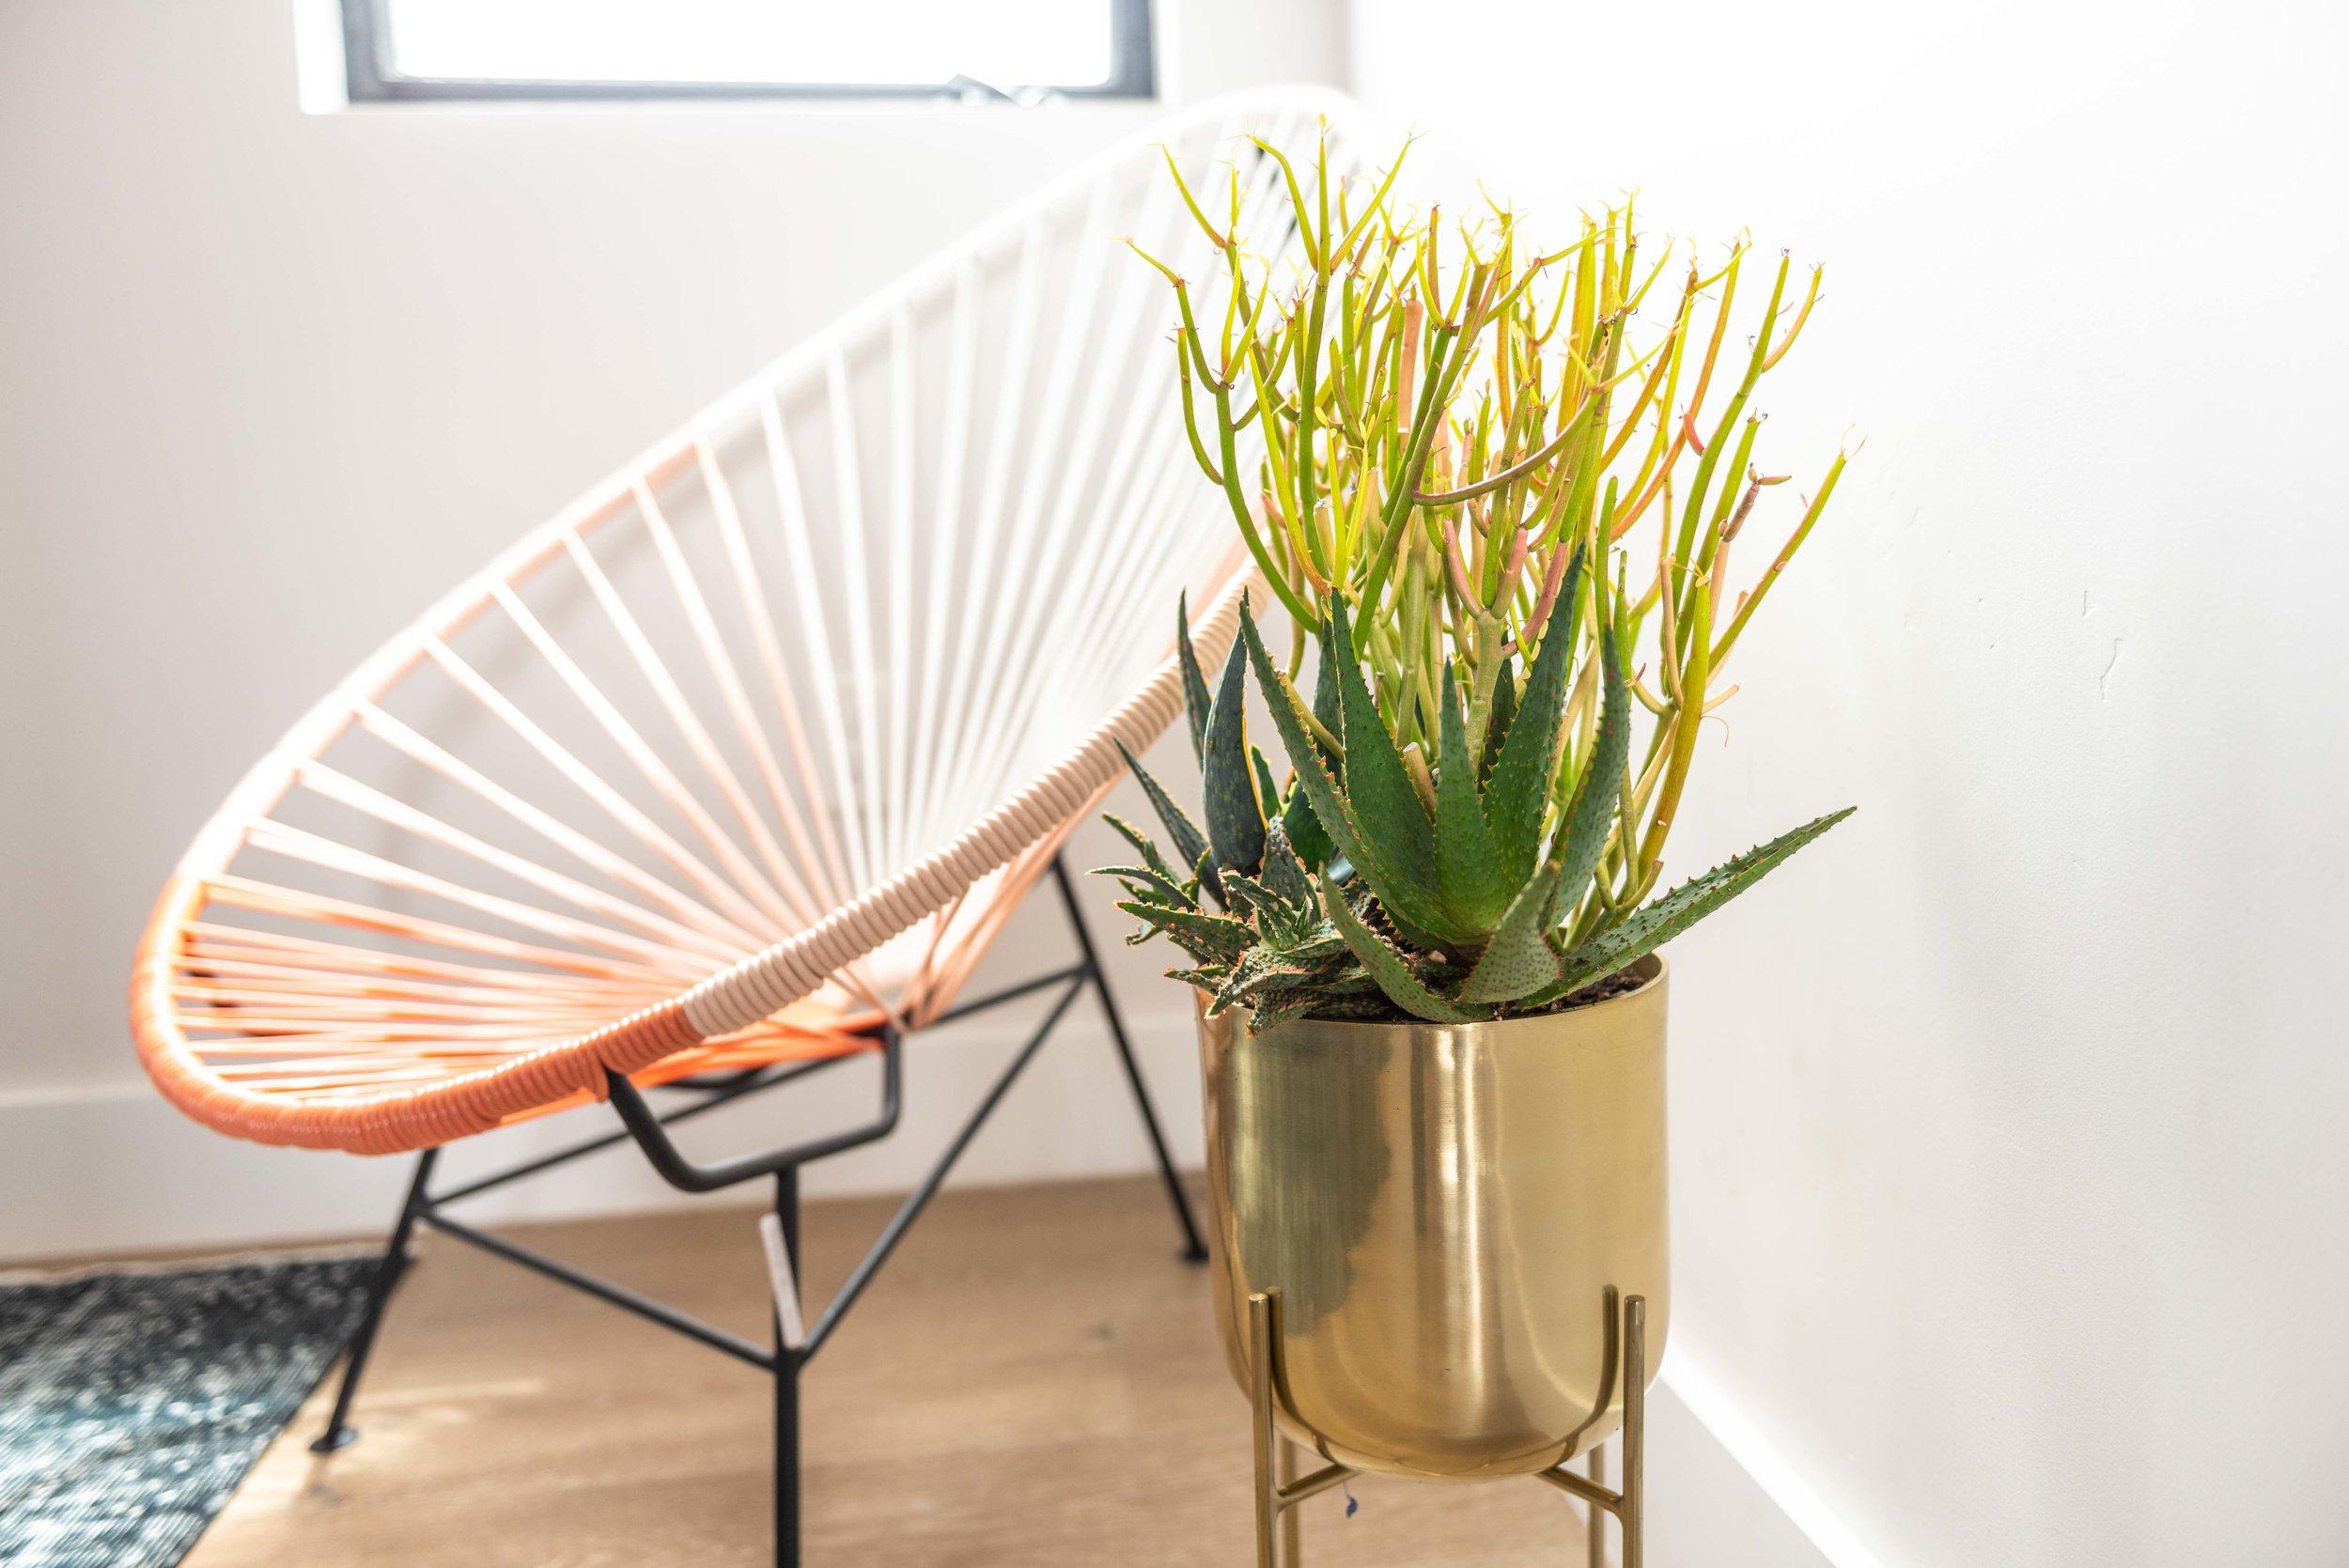 interior_plants-30.jpg